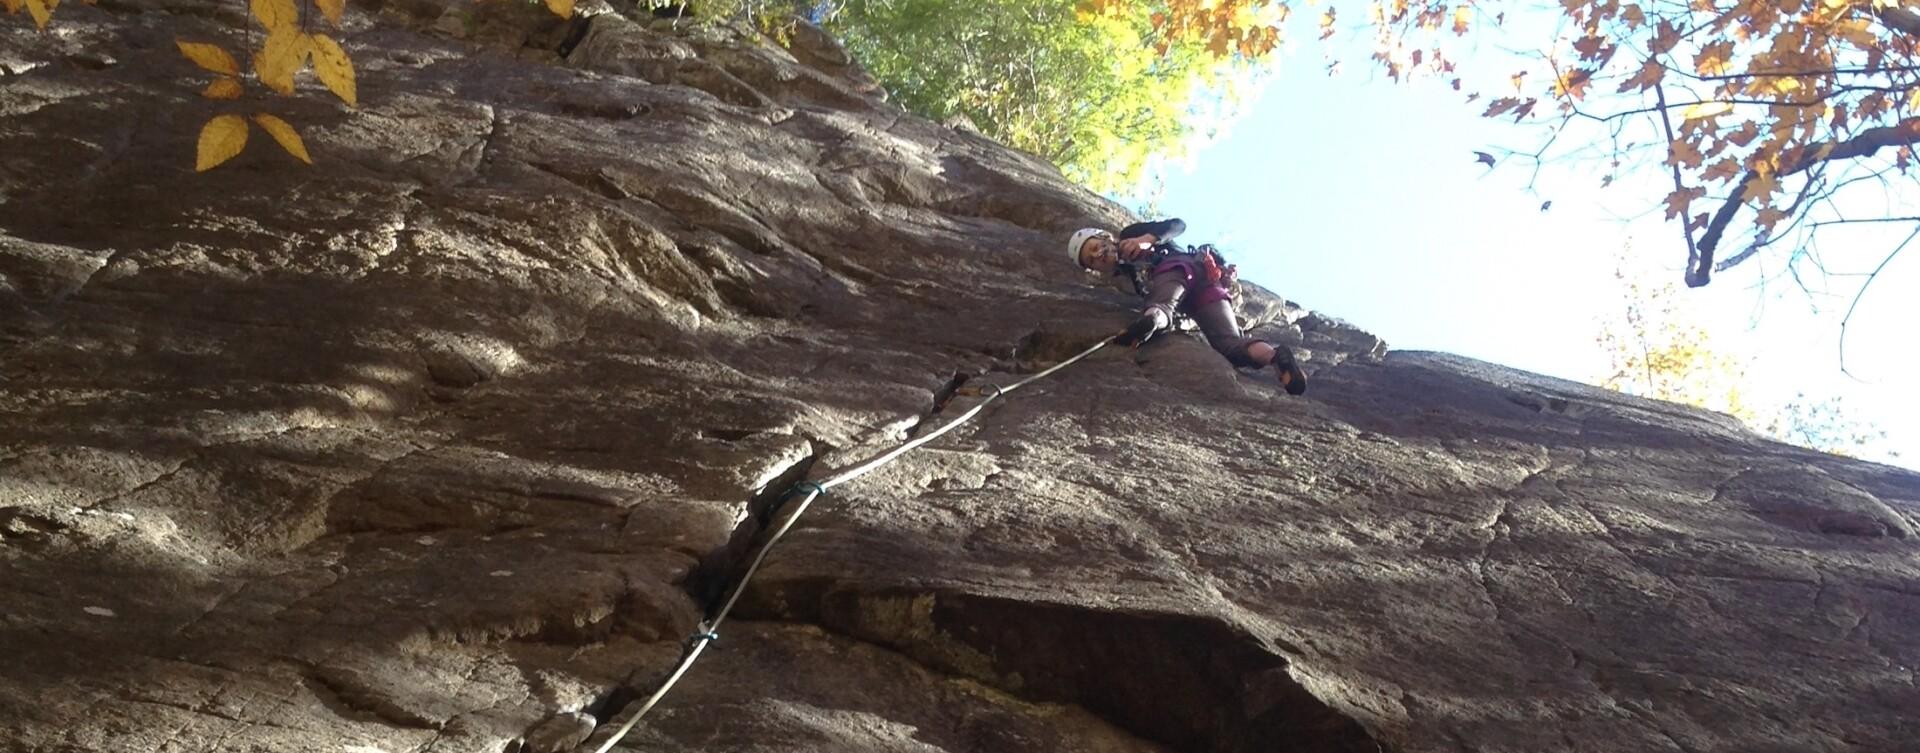 Guide d'escalade dans les Adirondacks